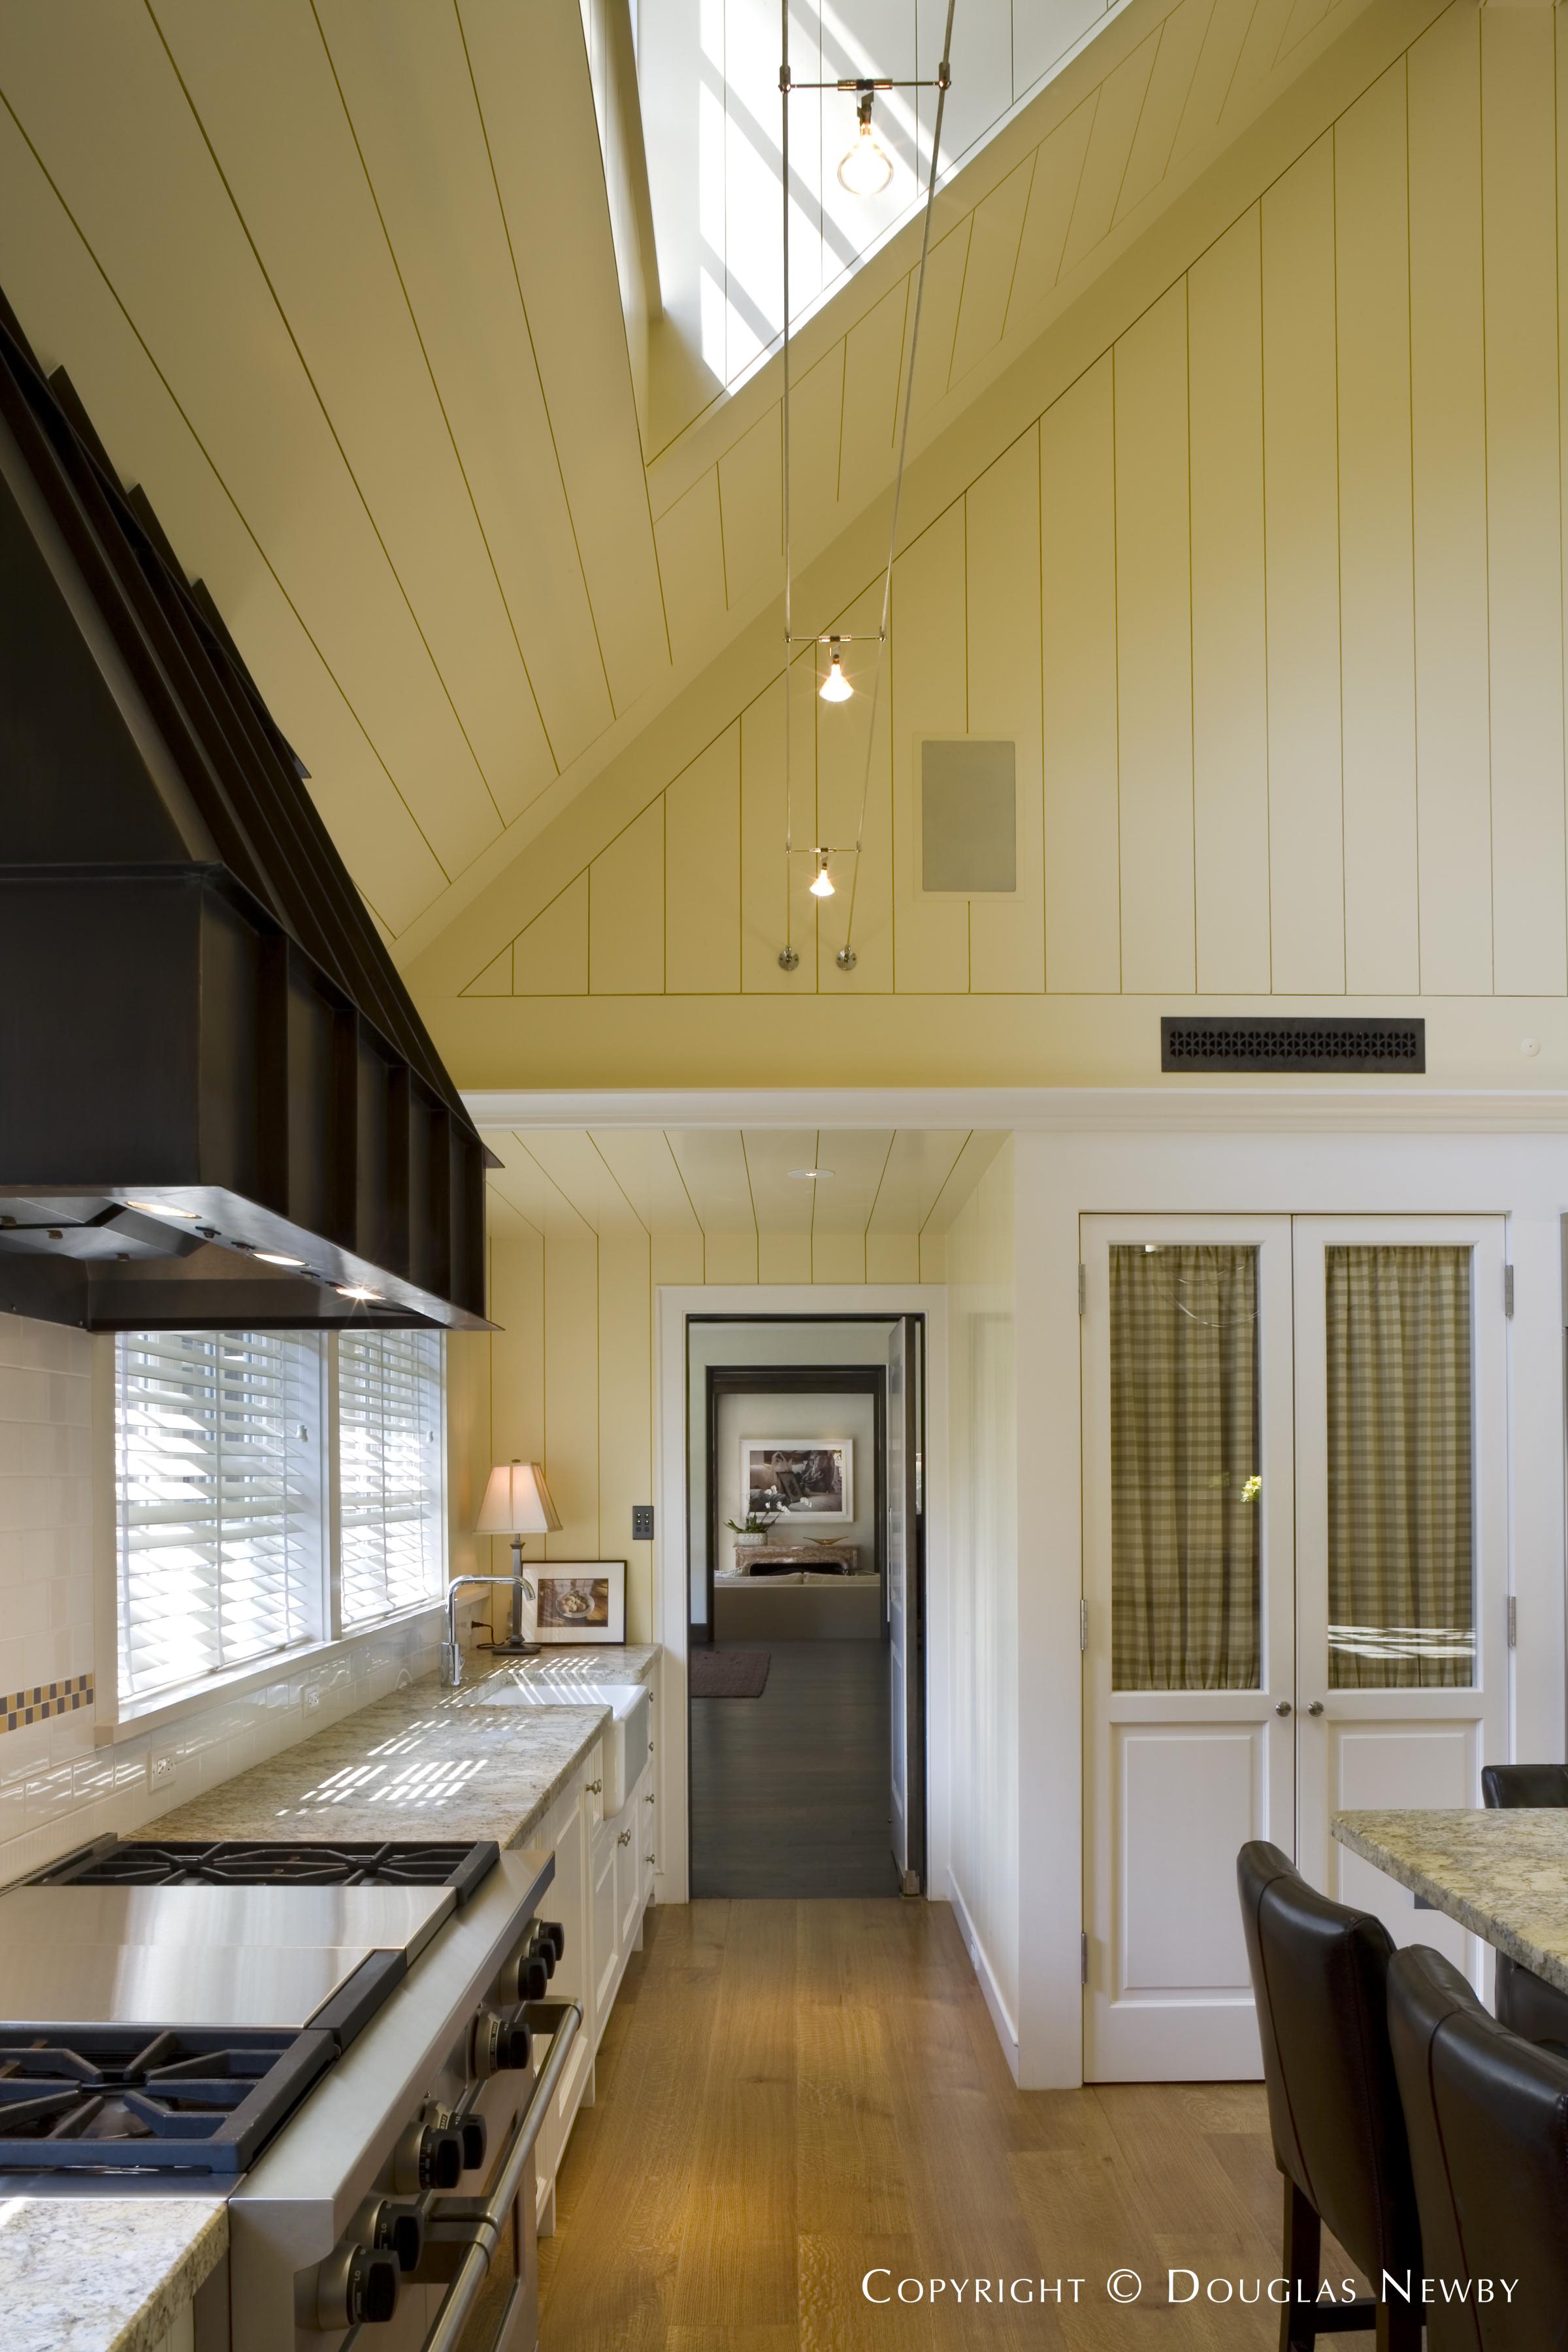 Home in Turtle Creek Corridor